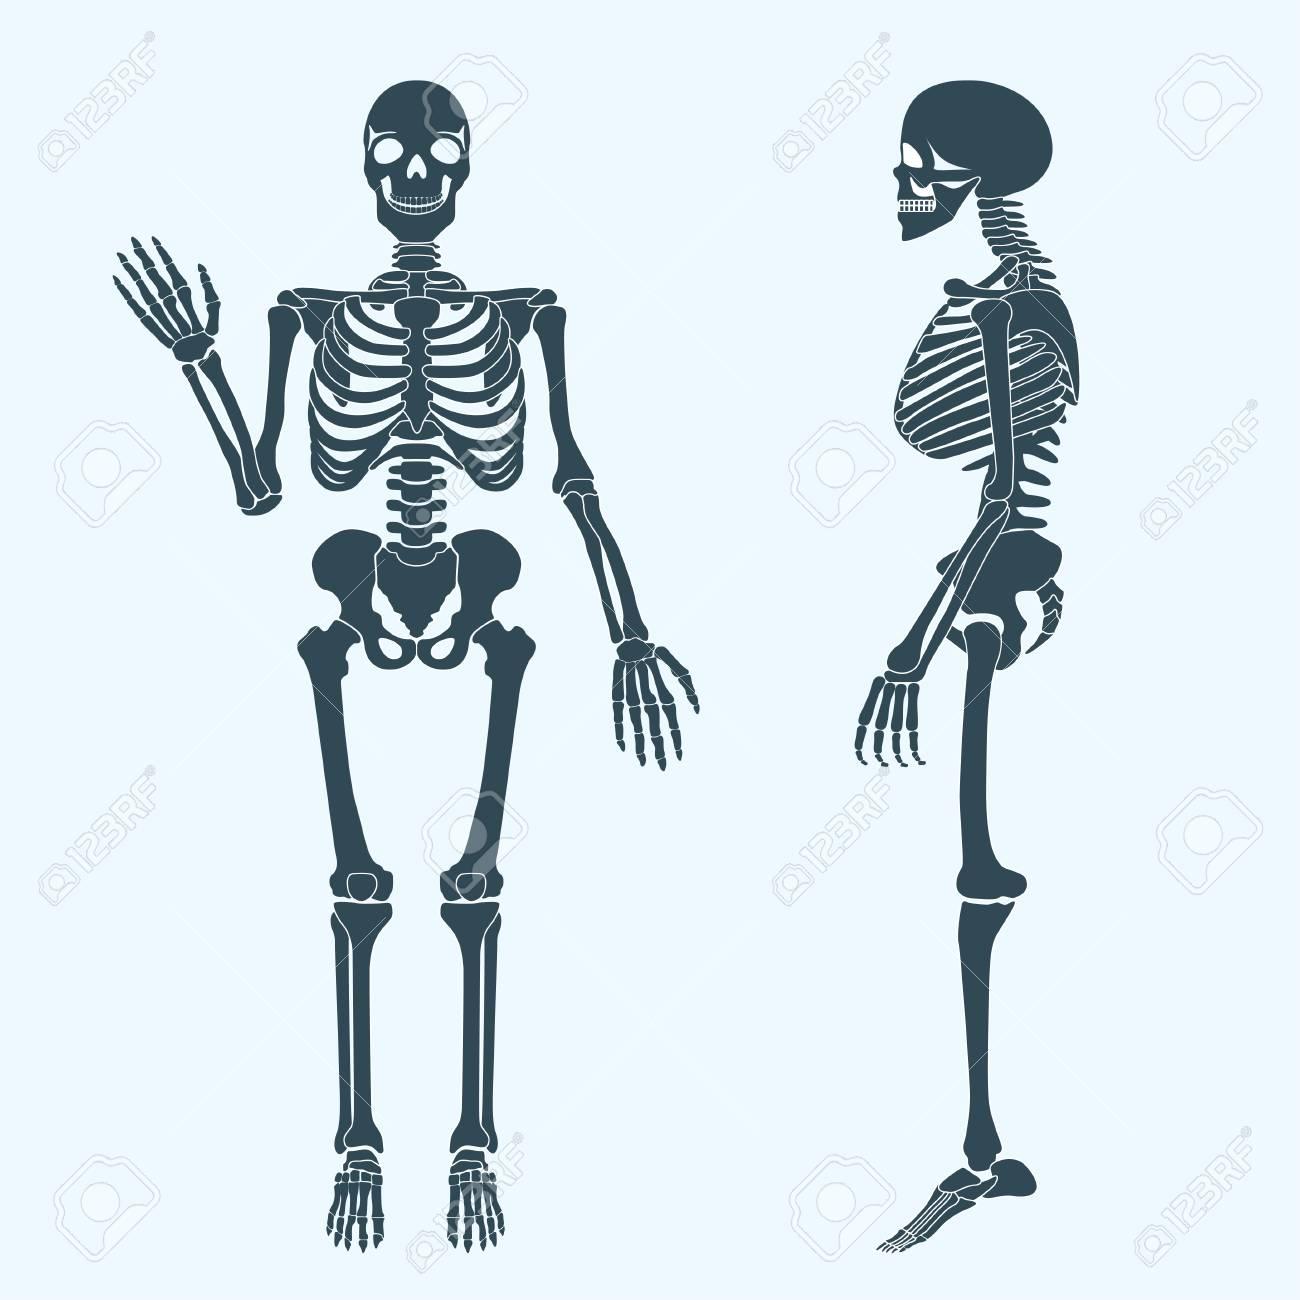 Human Bones Skeleton Silhouette Vector Royalty Free Cliparts